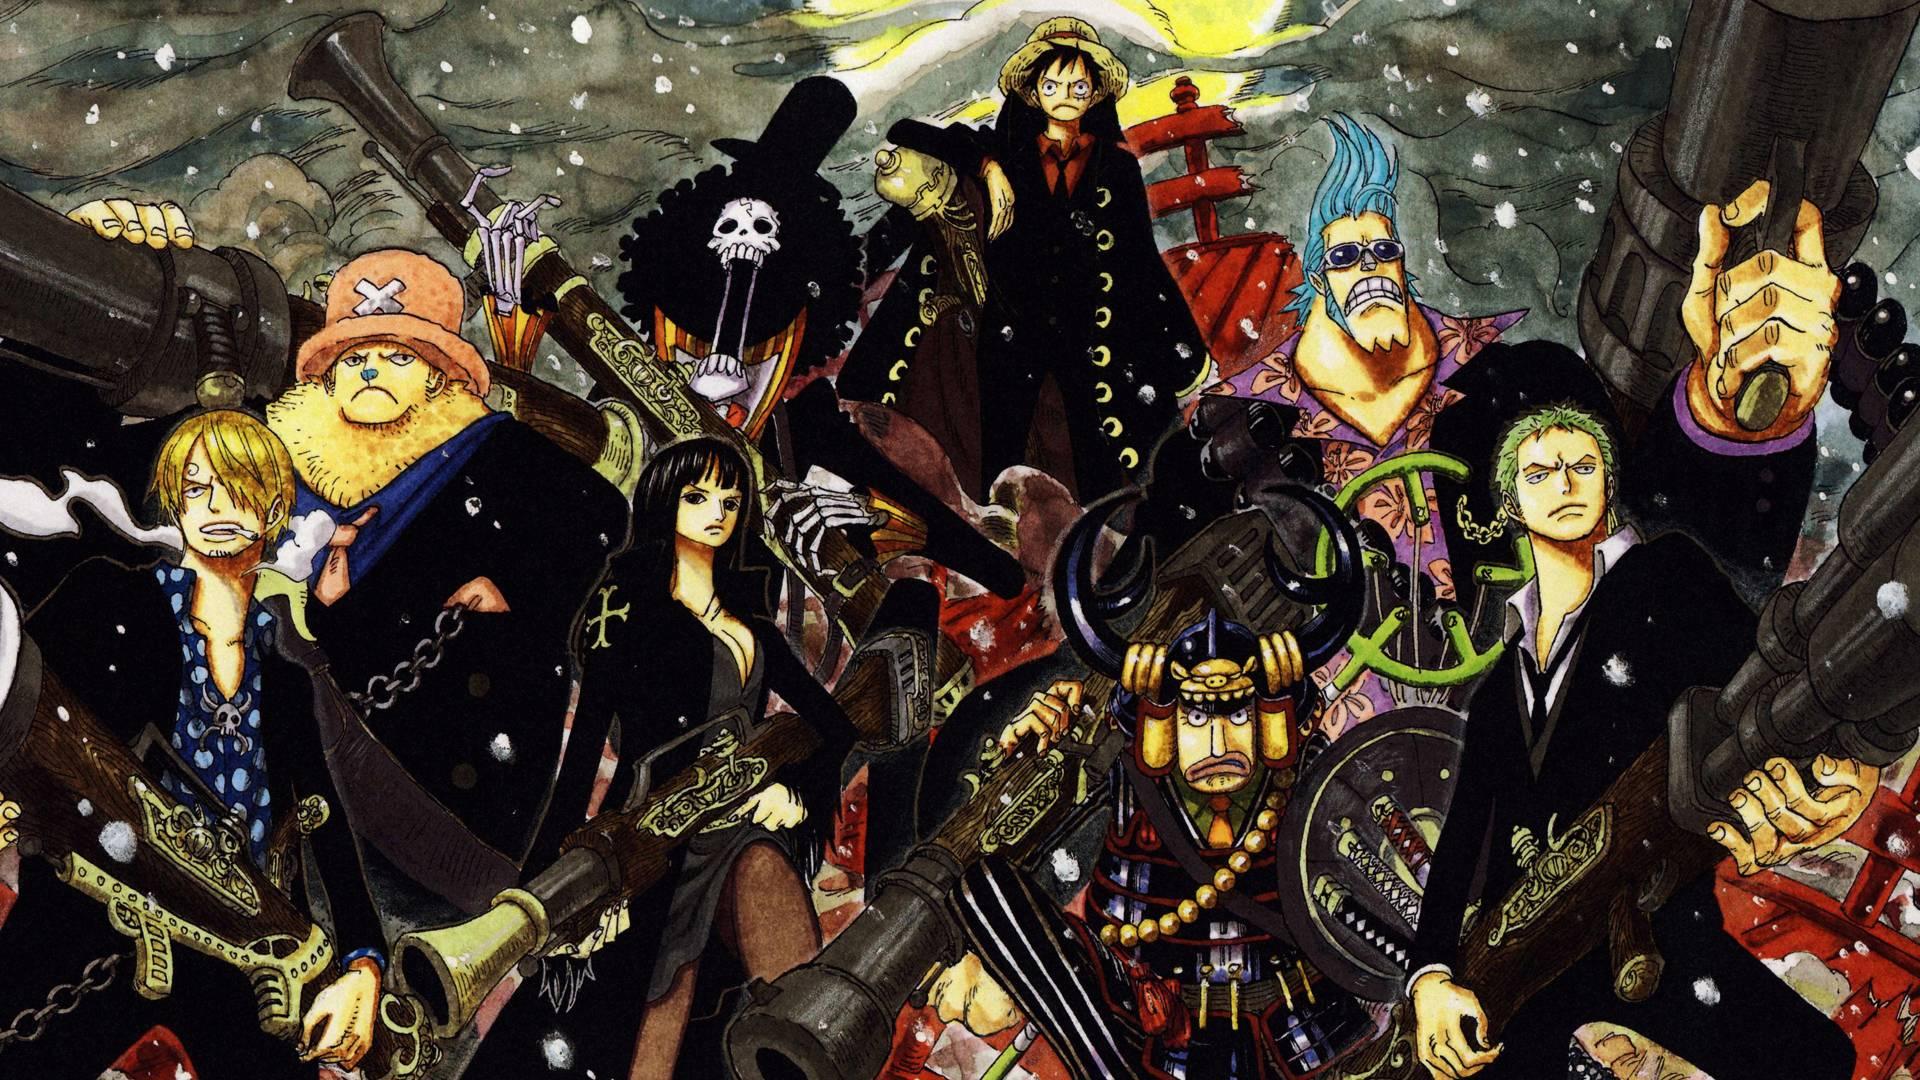 One Piece New World Zoro Full Hd Wallpapers Hd Wallpaper Site 1920x1080